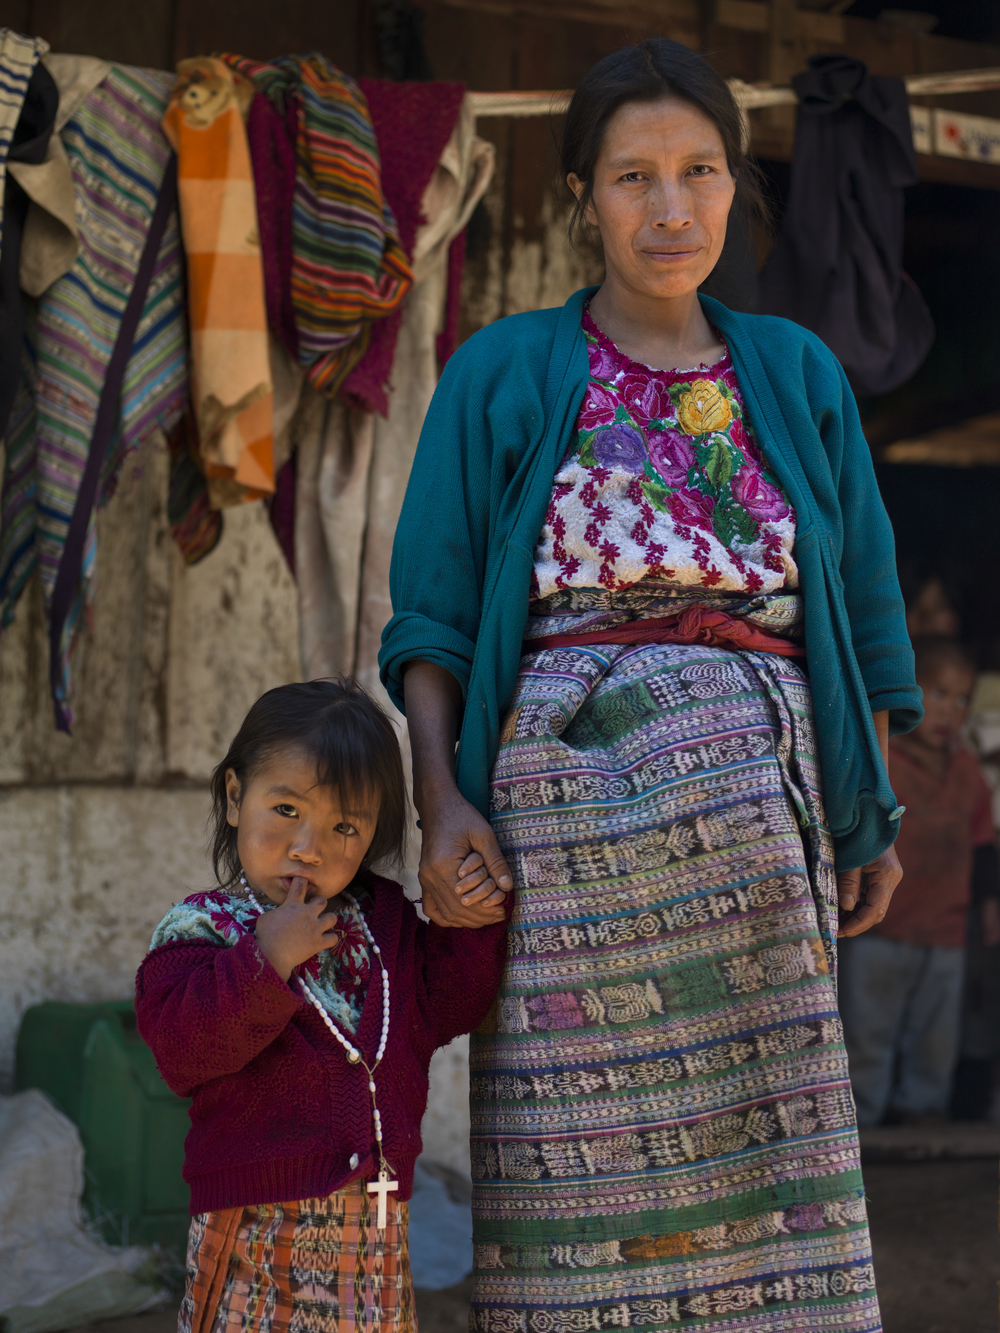 guatemala2_0010.jpg